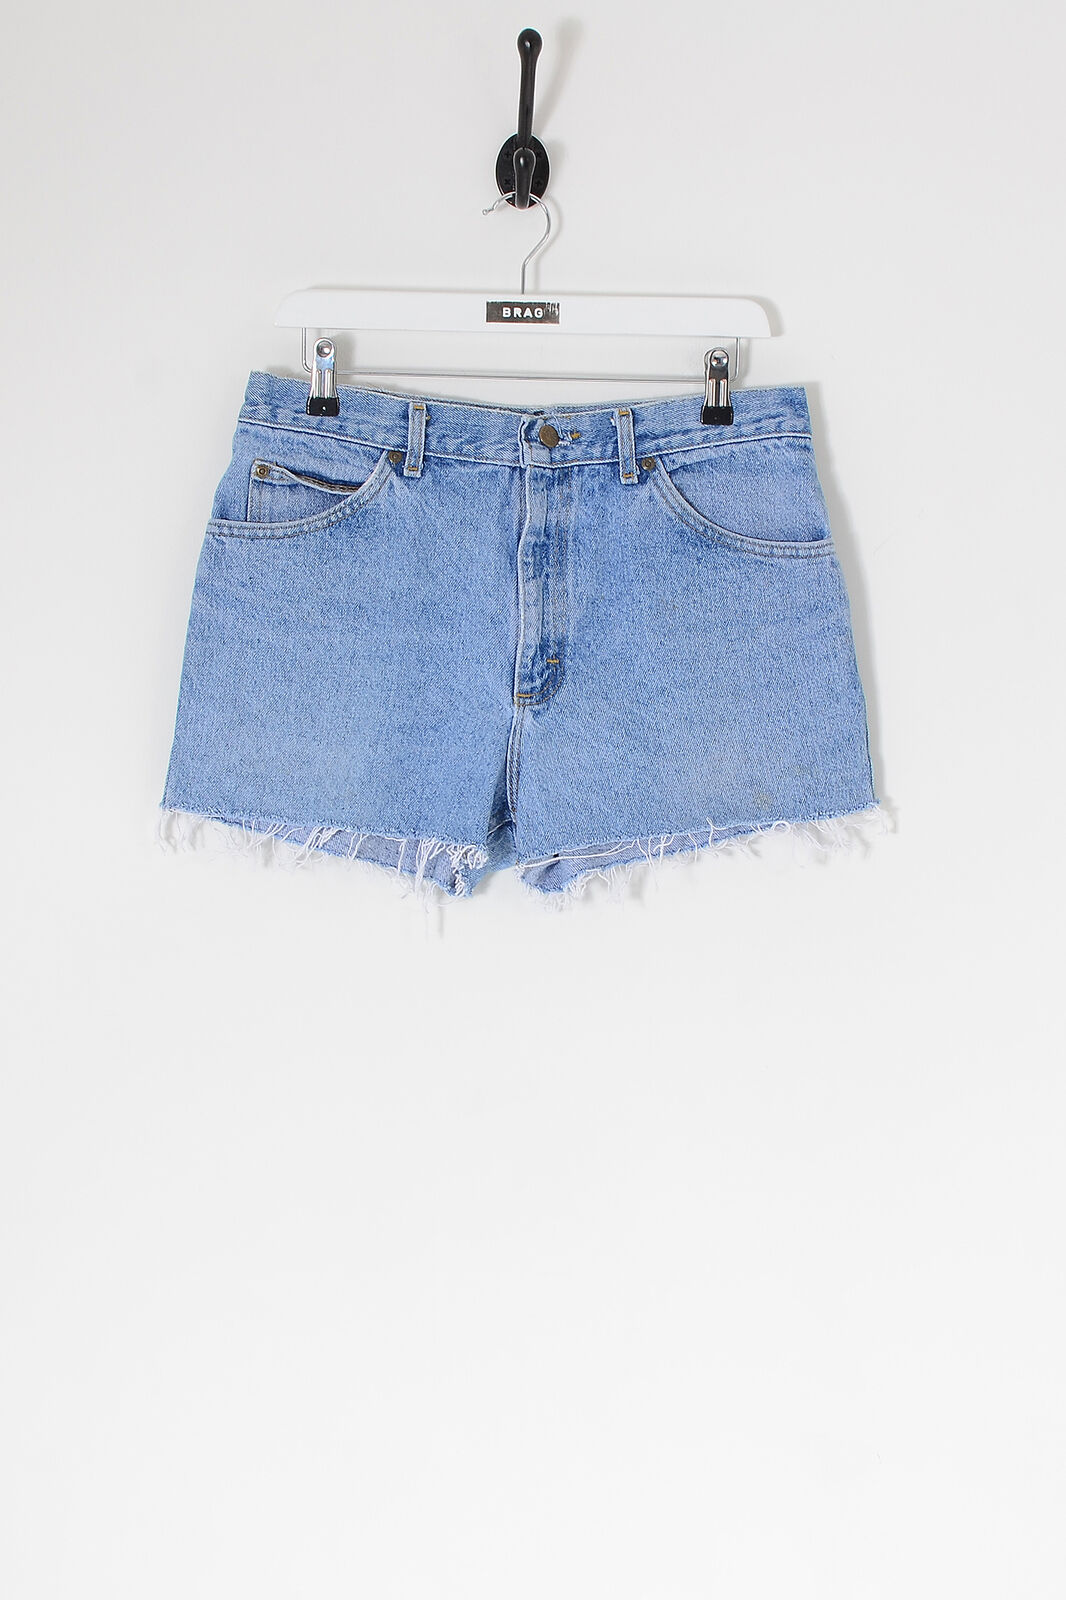 Vintage Lee Abgetrennte Denim Shorts Hellblau (W31)